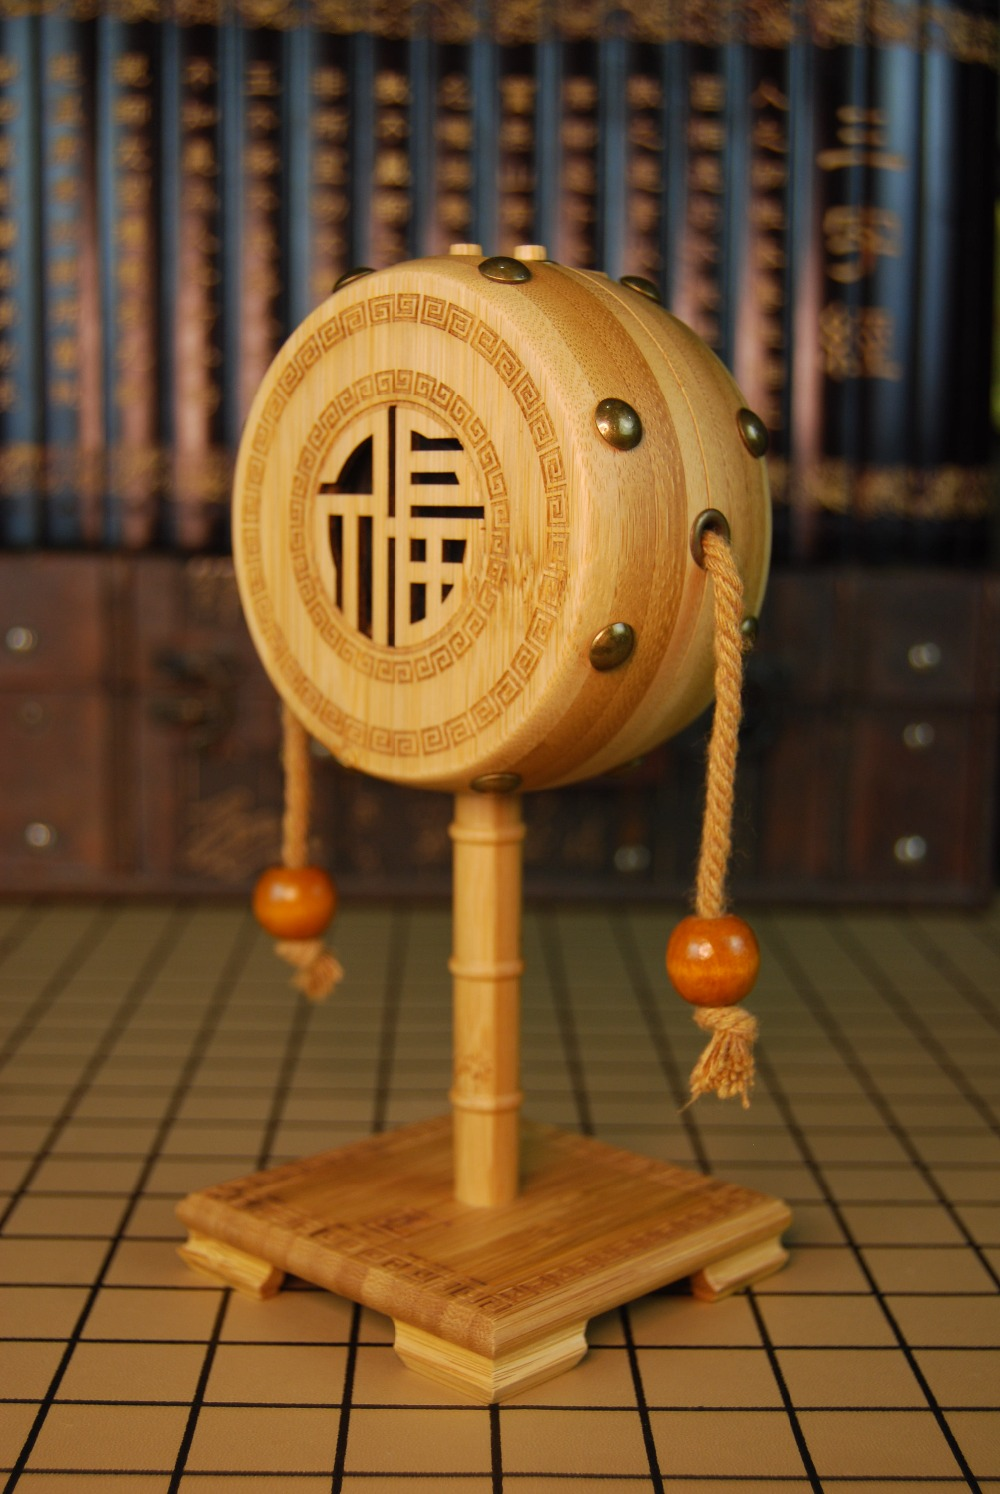 Bamboo speaker bluetooth portable stereo version, speaker maximum power 5W watt, bluetooth player, handmade crafts.